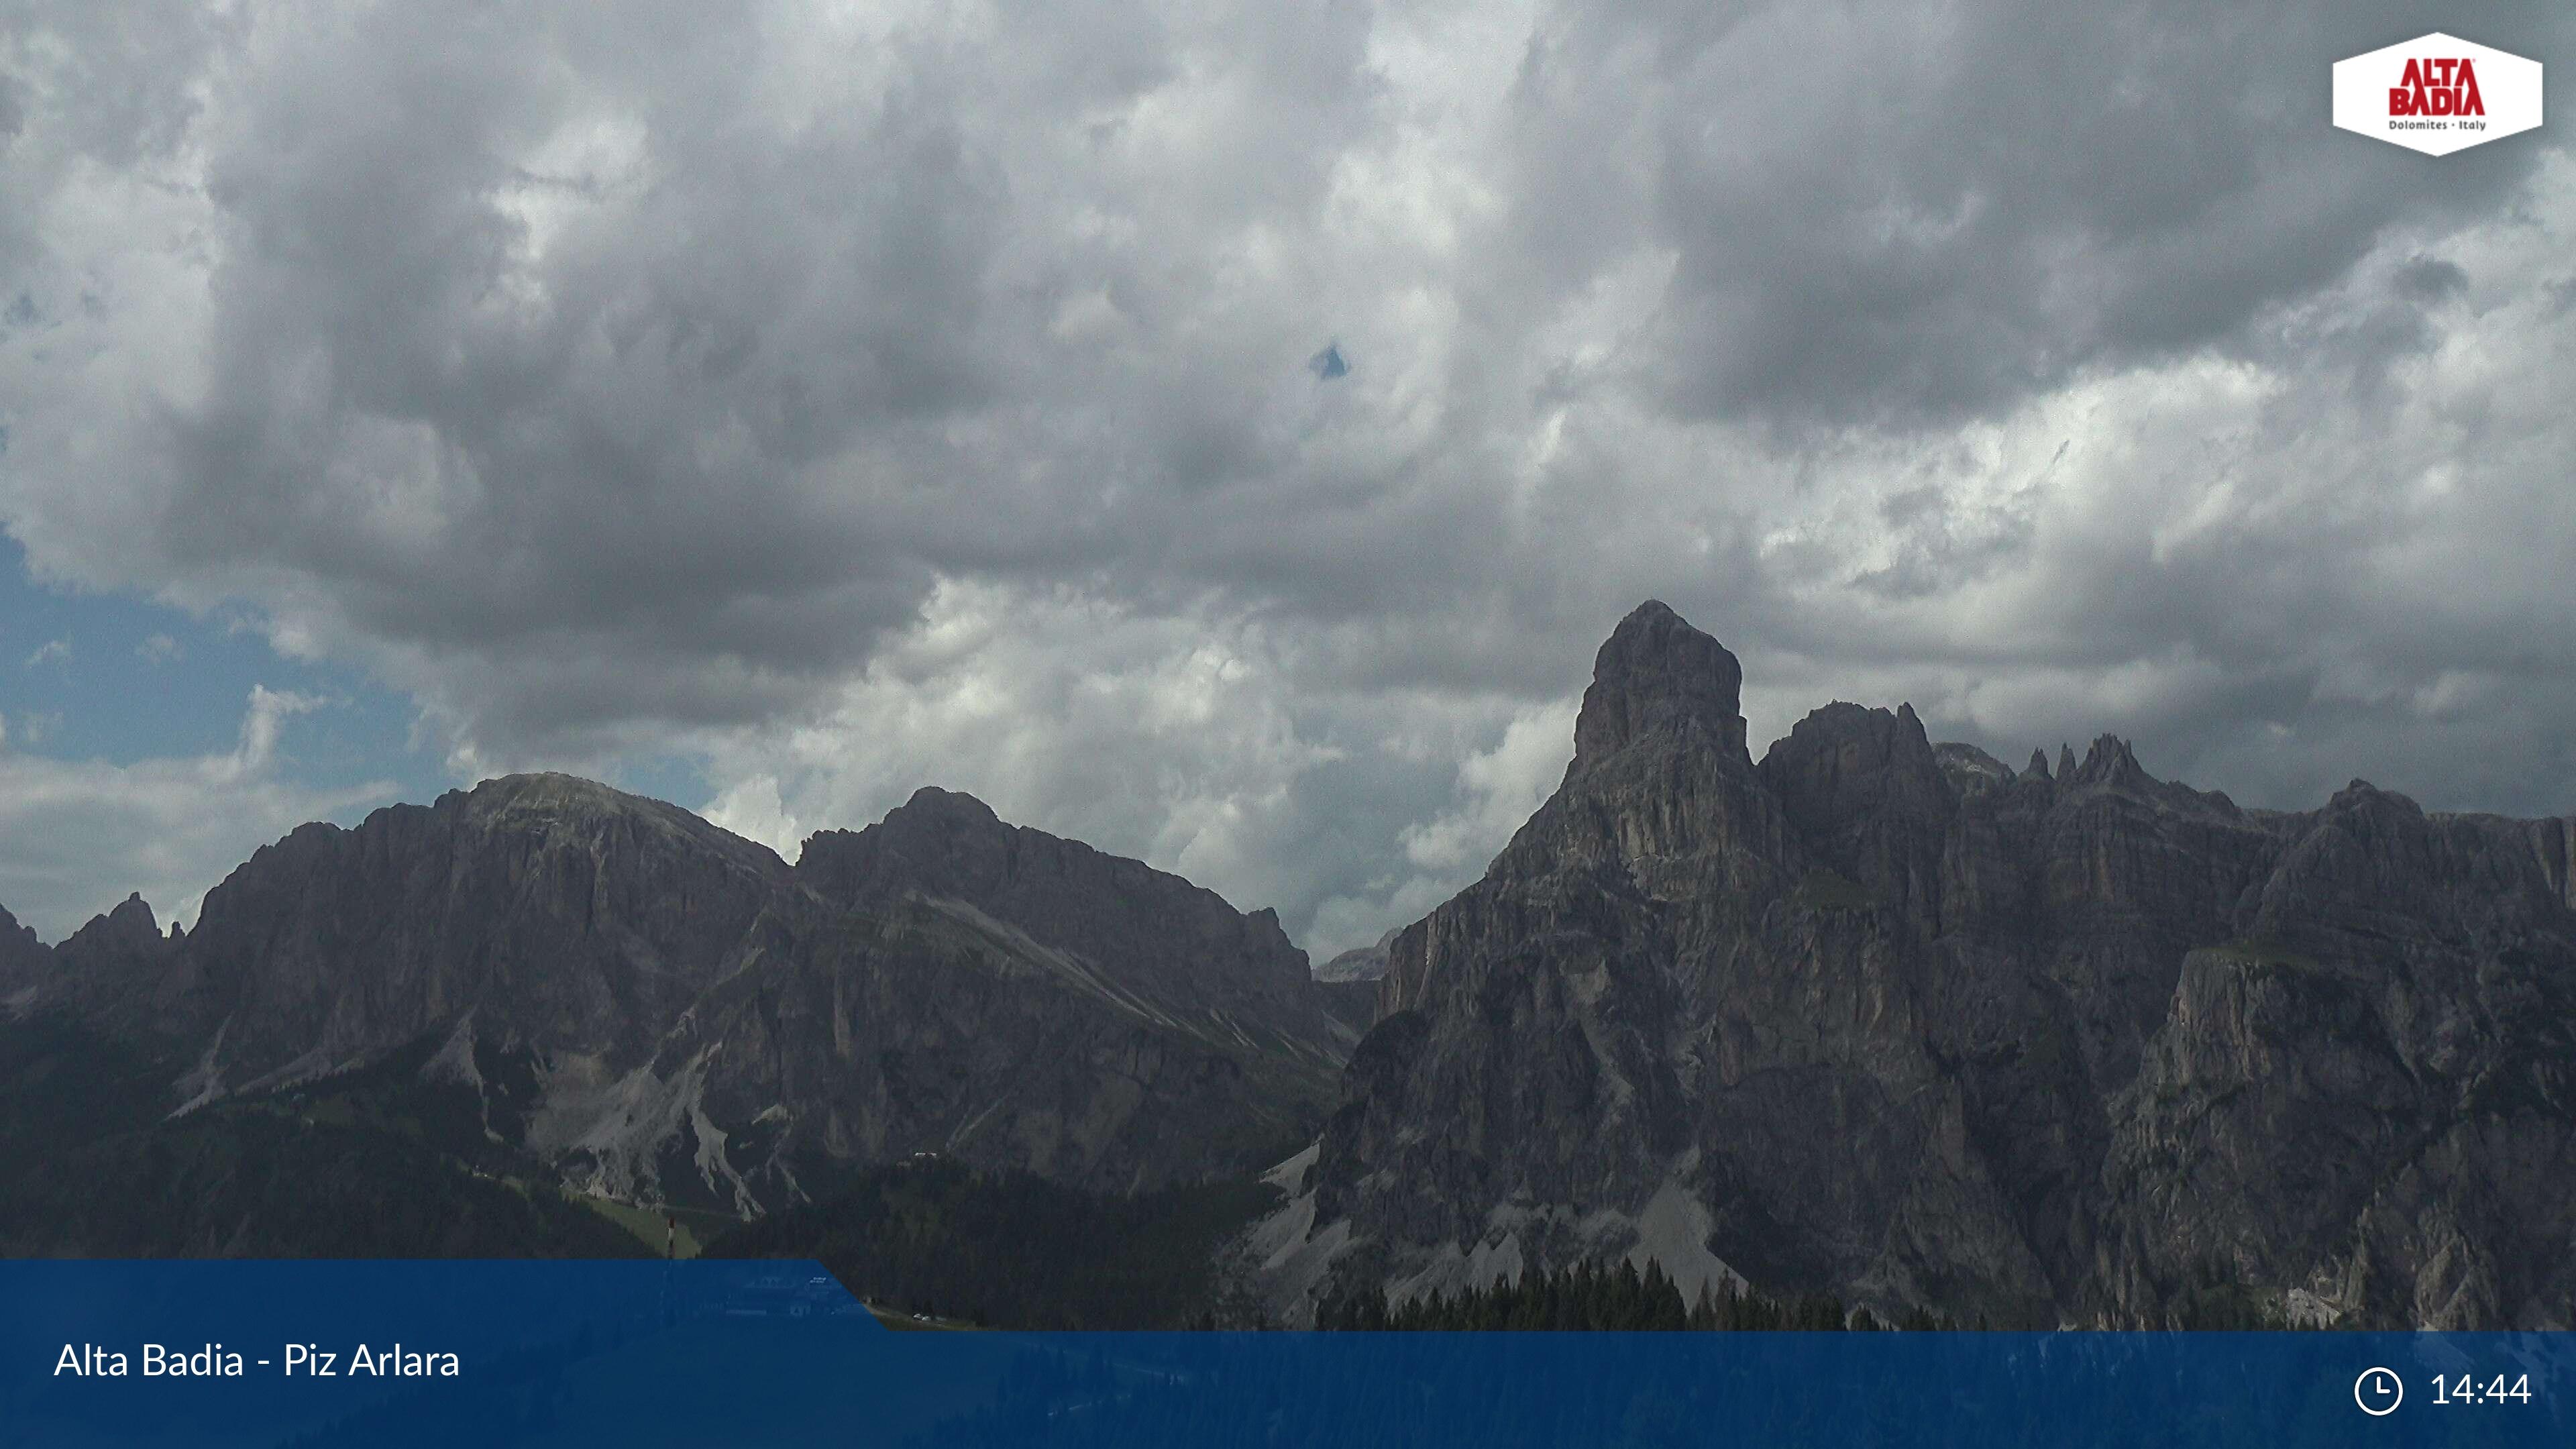 Webcam en Piz Arlara, Alta Badia (Alpes Italianos)